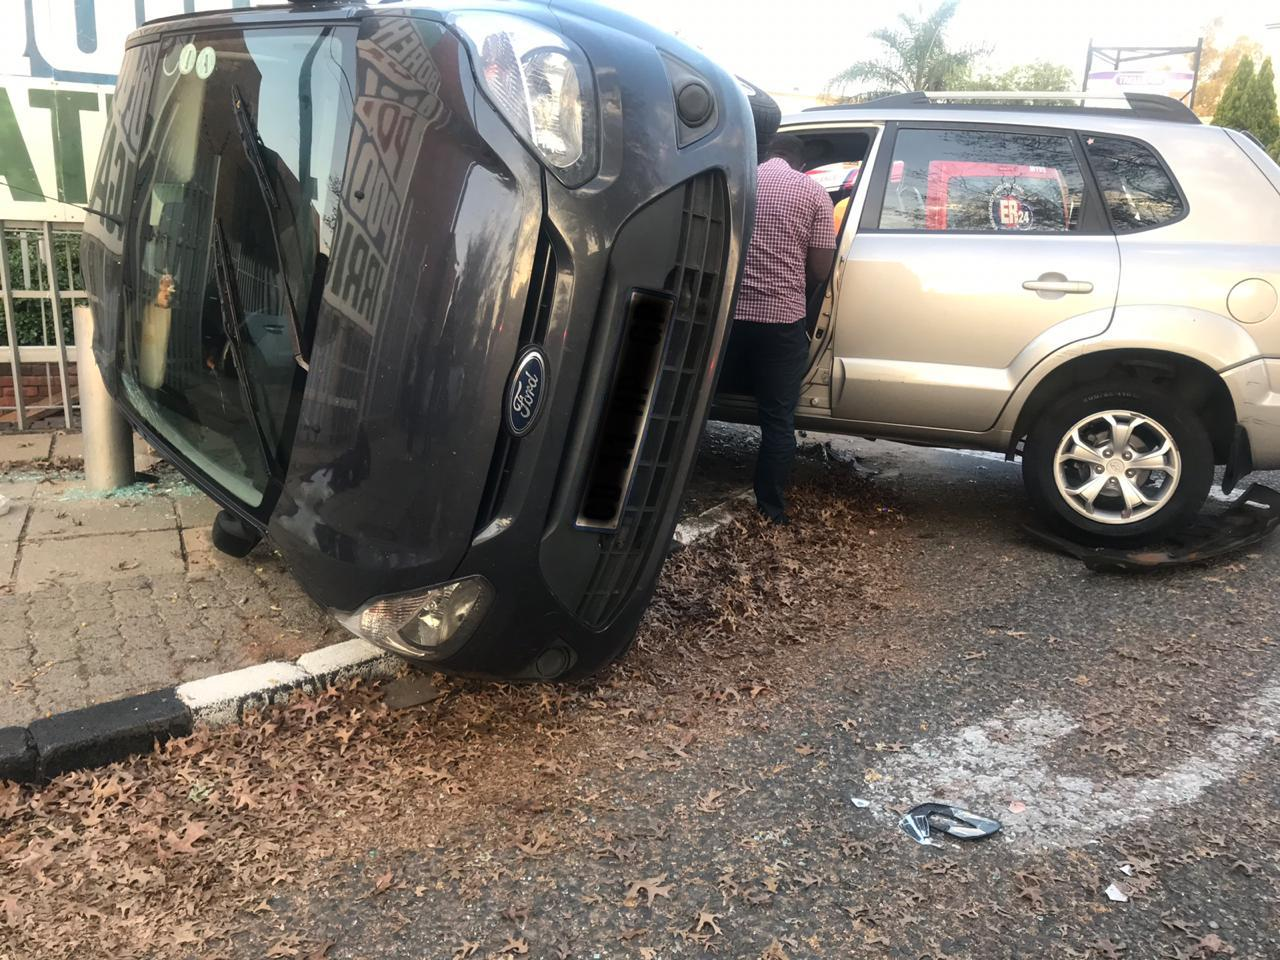 Several injured in collision in Randburg